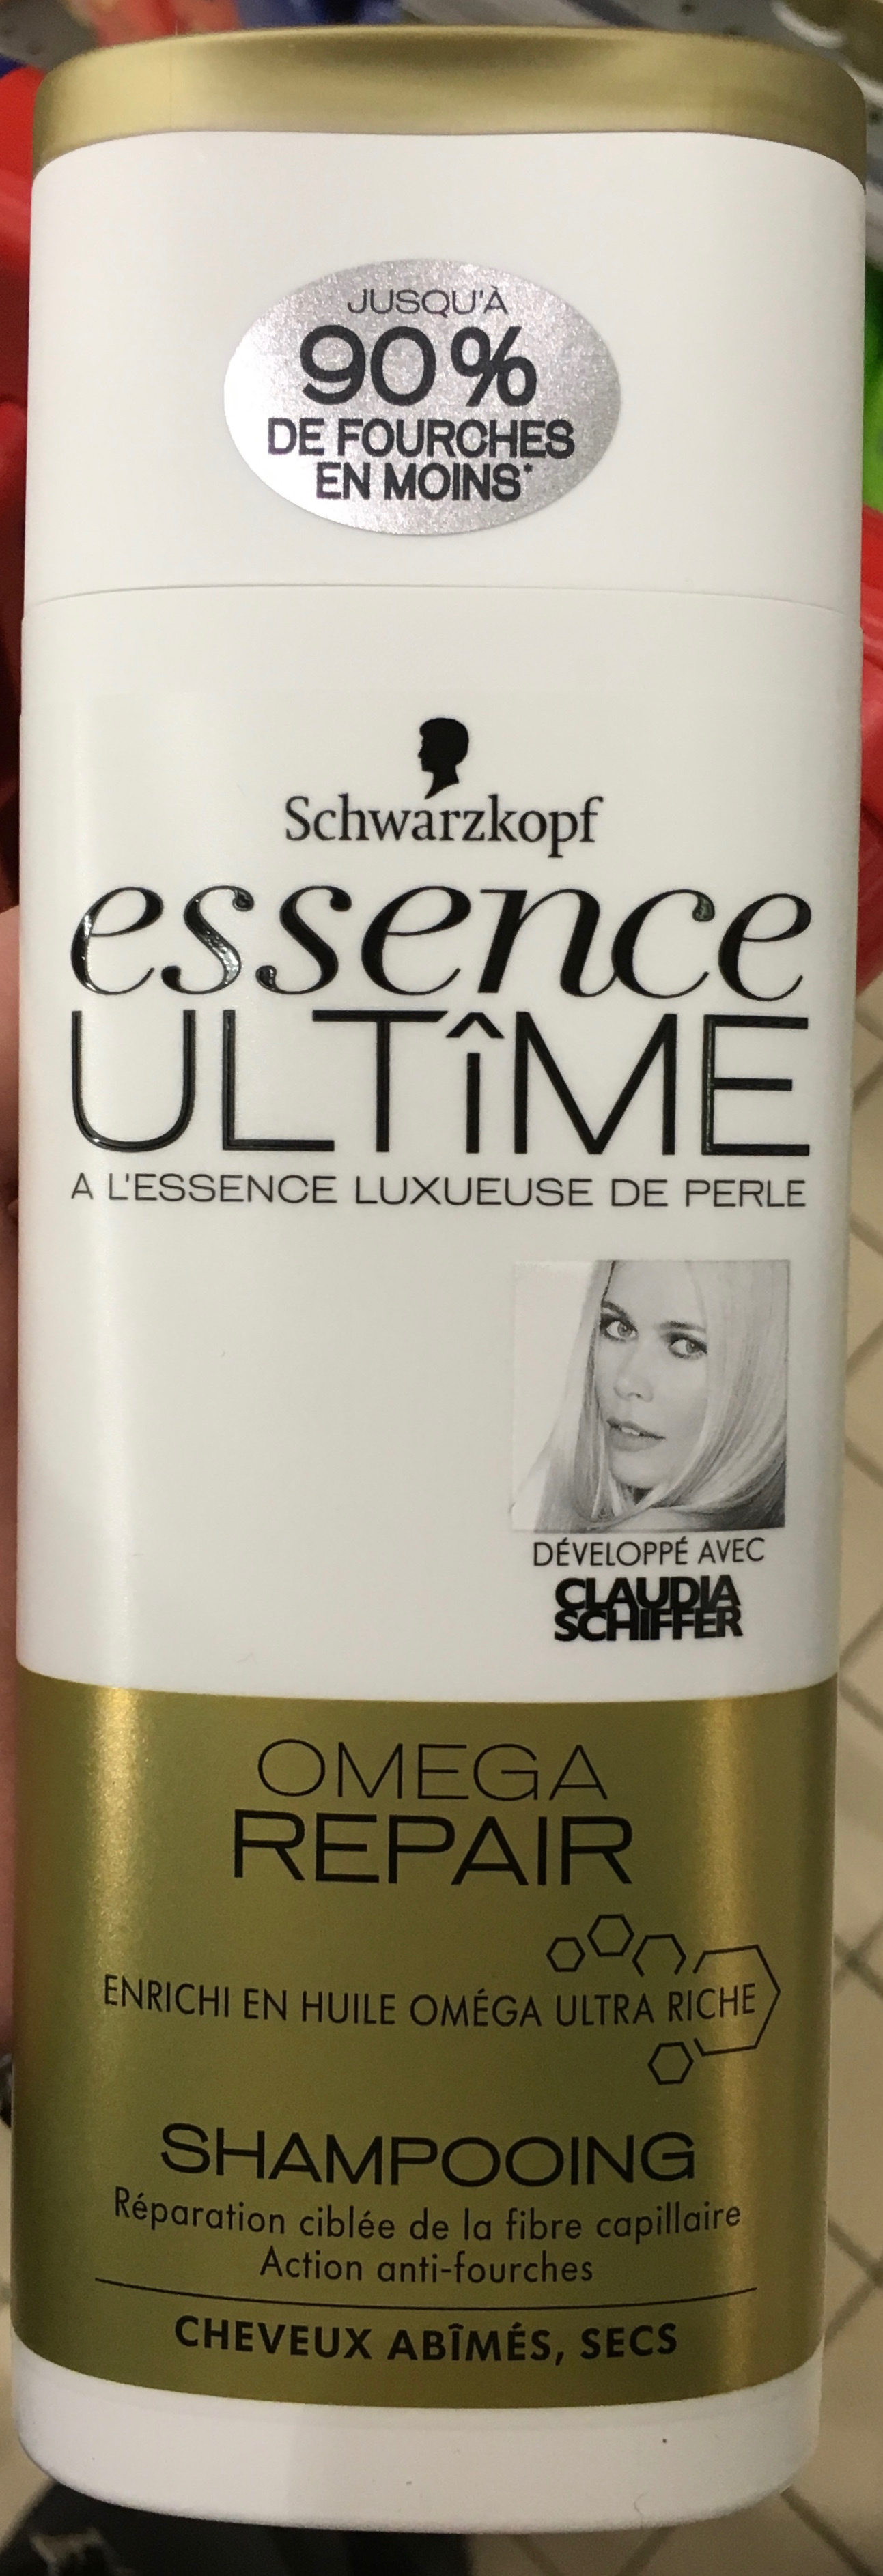 Essence Ultime Omega Repair Shampooing - Produit